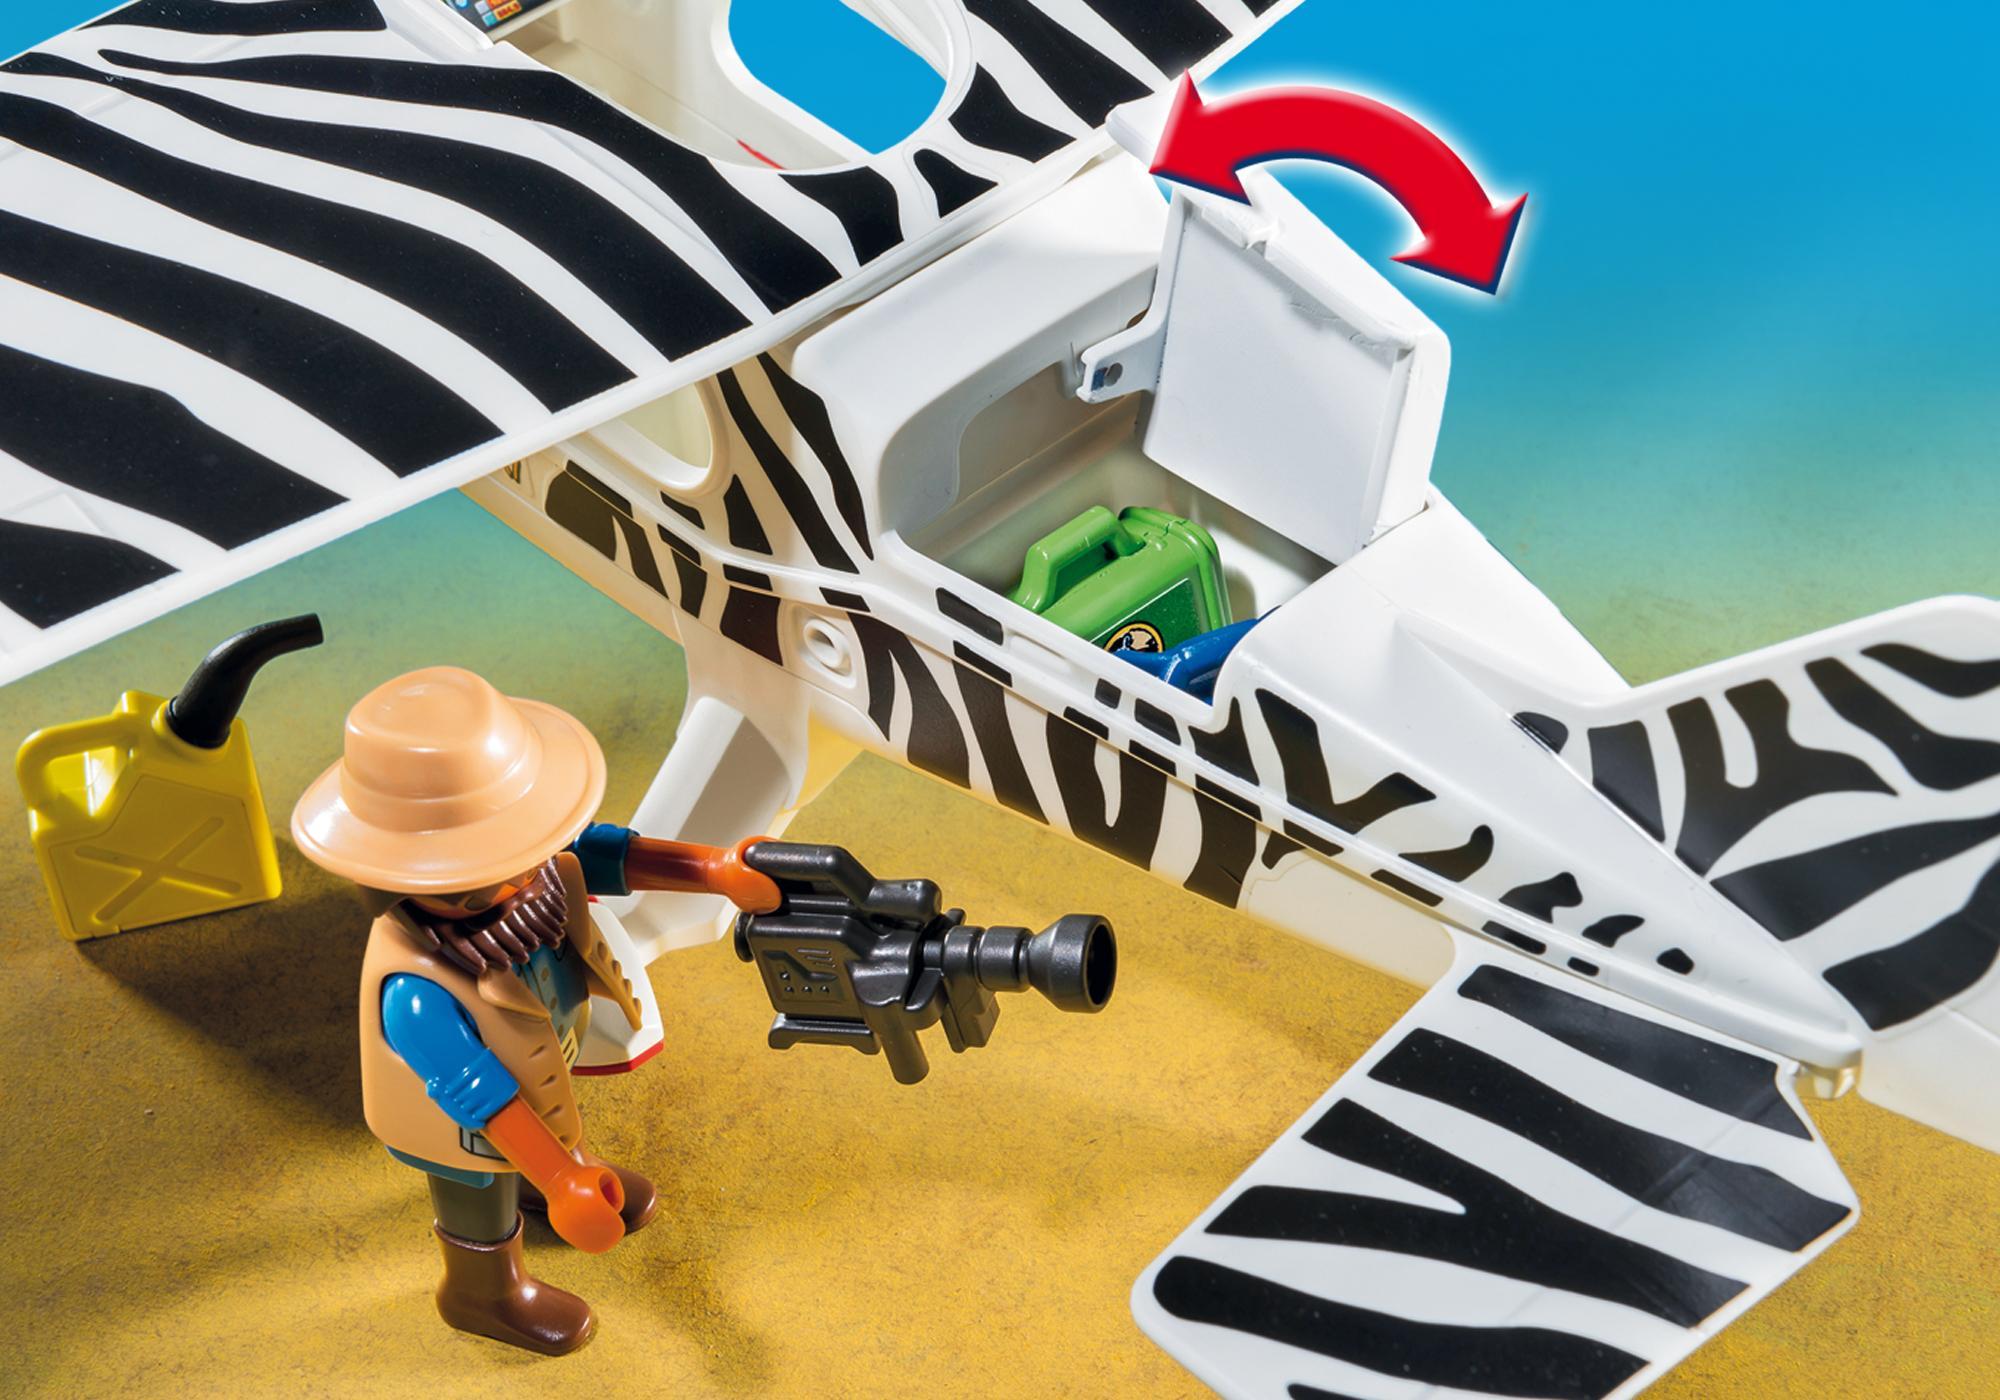 http://media.playmobil.com/i/playmobil/6938_product_extra1/Avion avec explorateurs